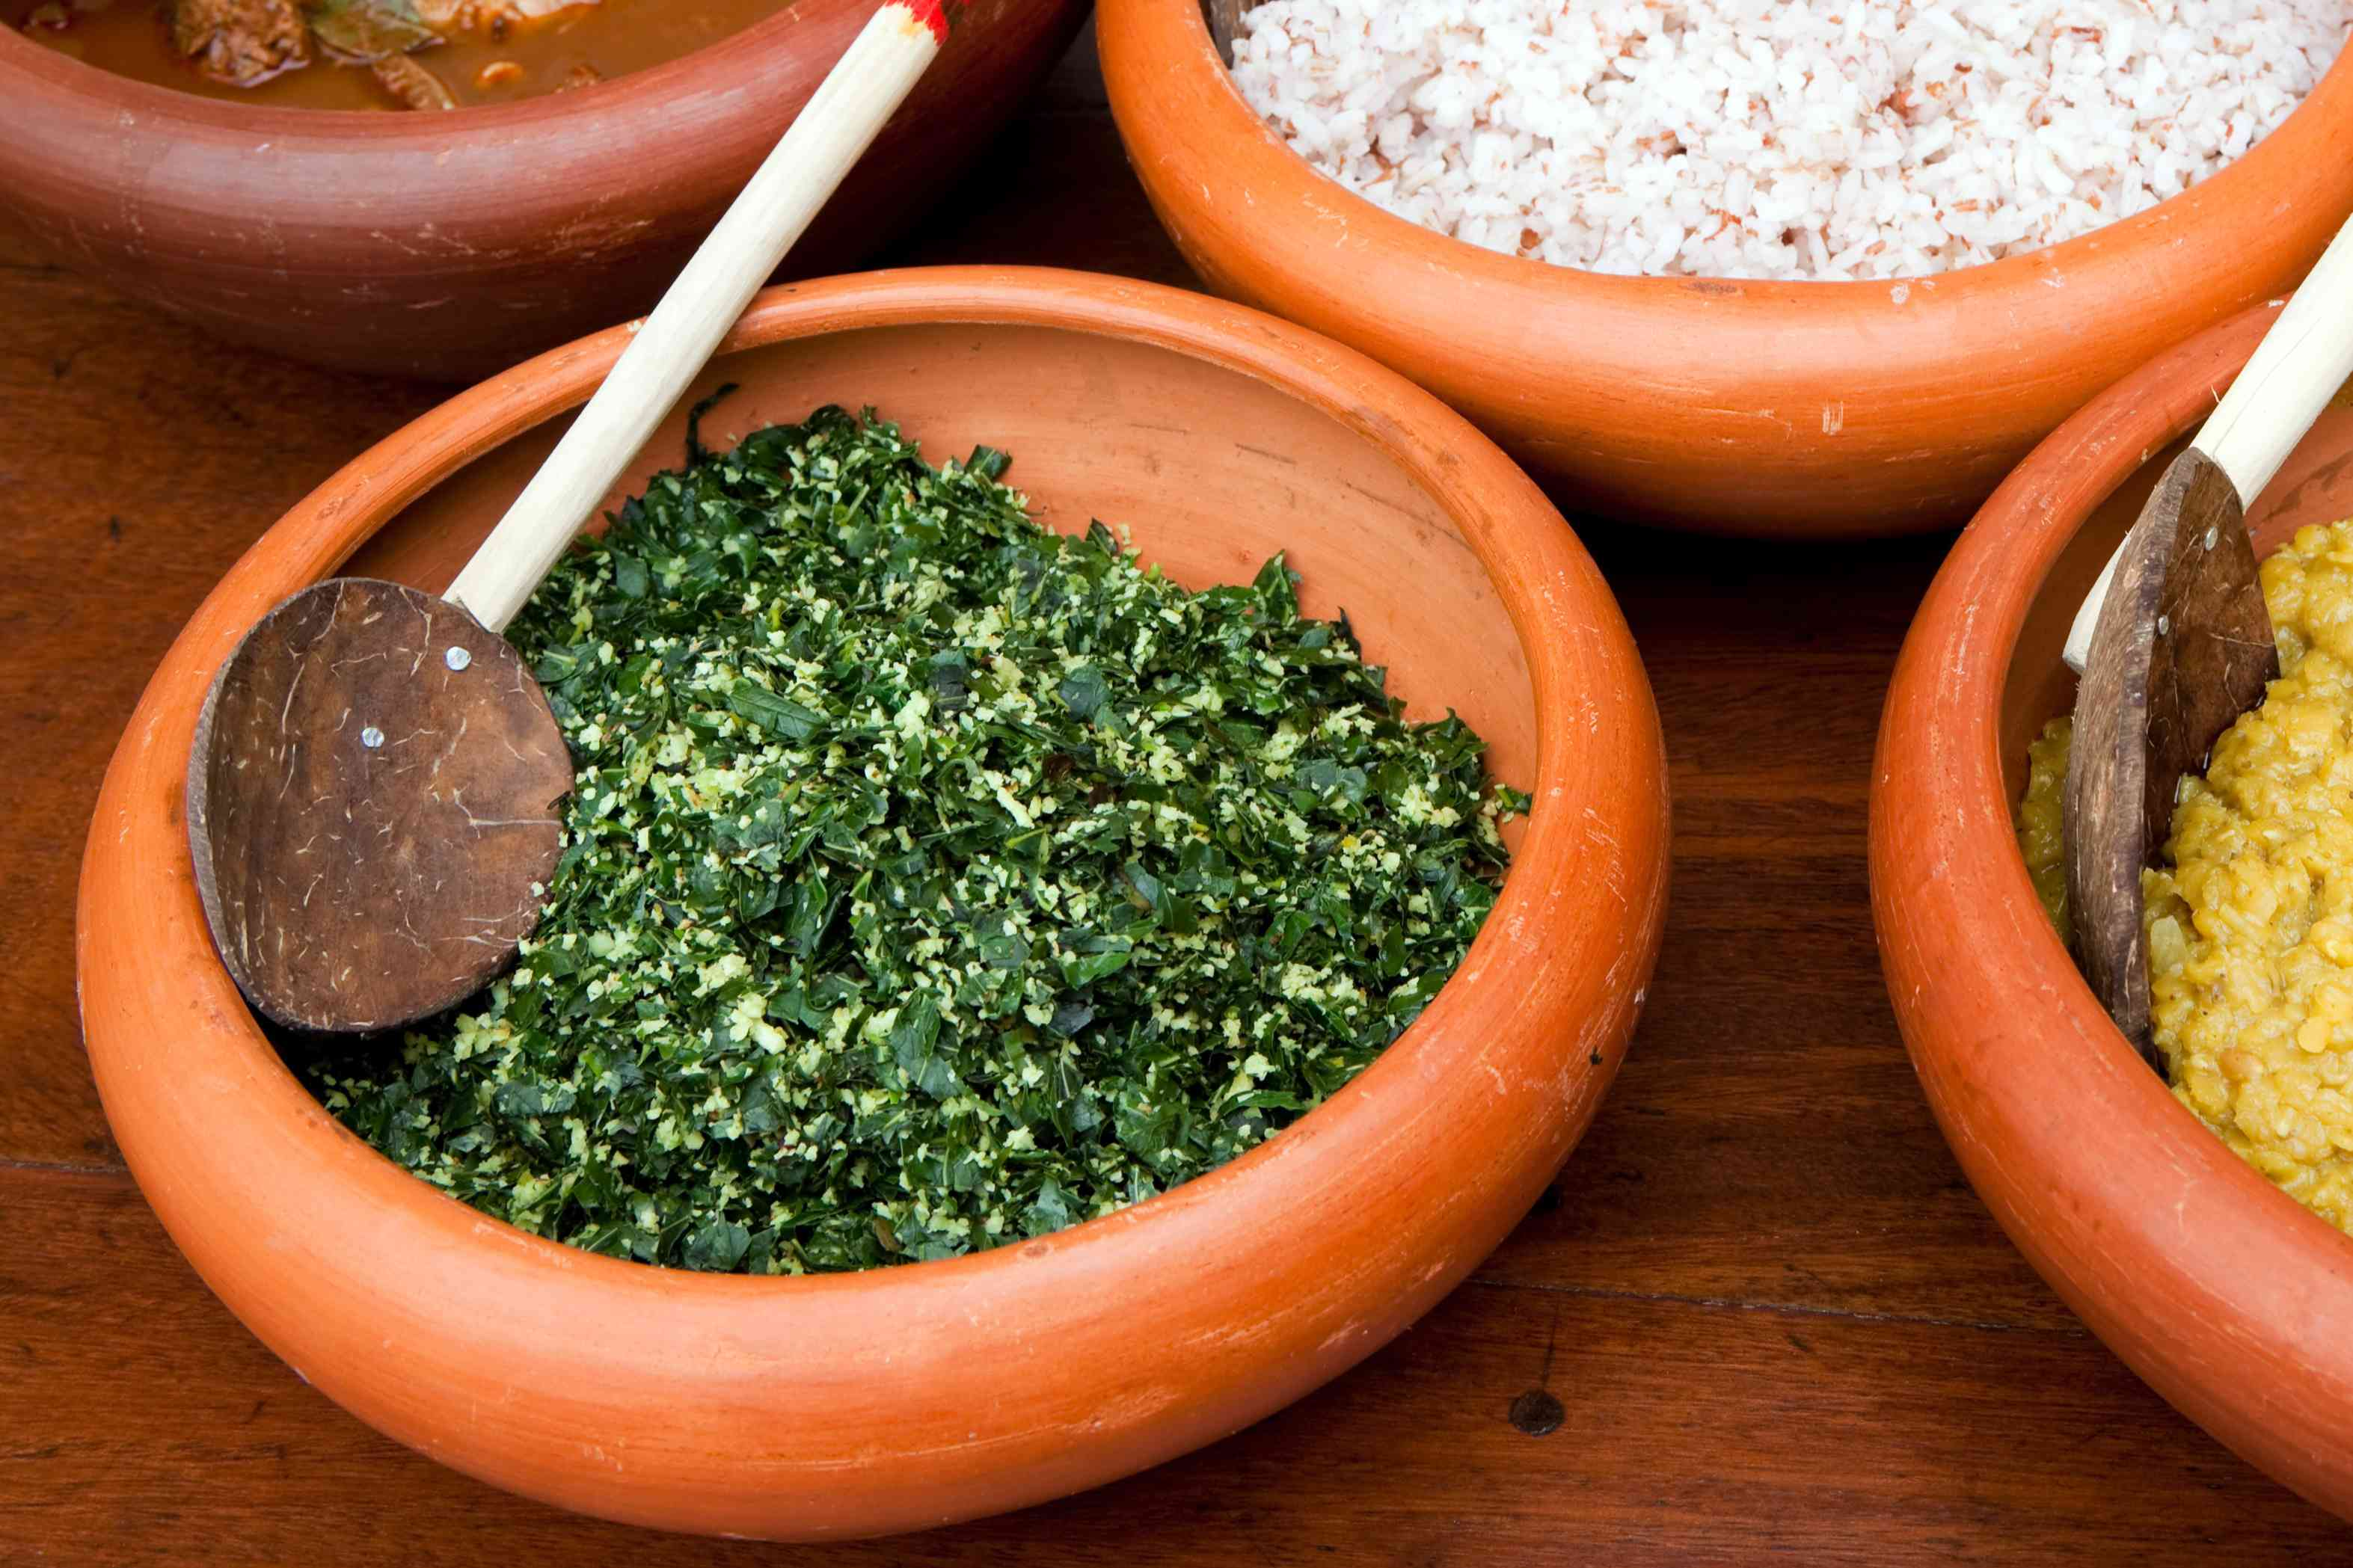 Sri Lankan mallung, shredded greens with a wooden spoon in an orange bowl